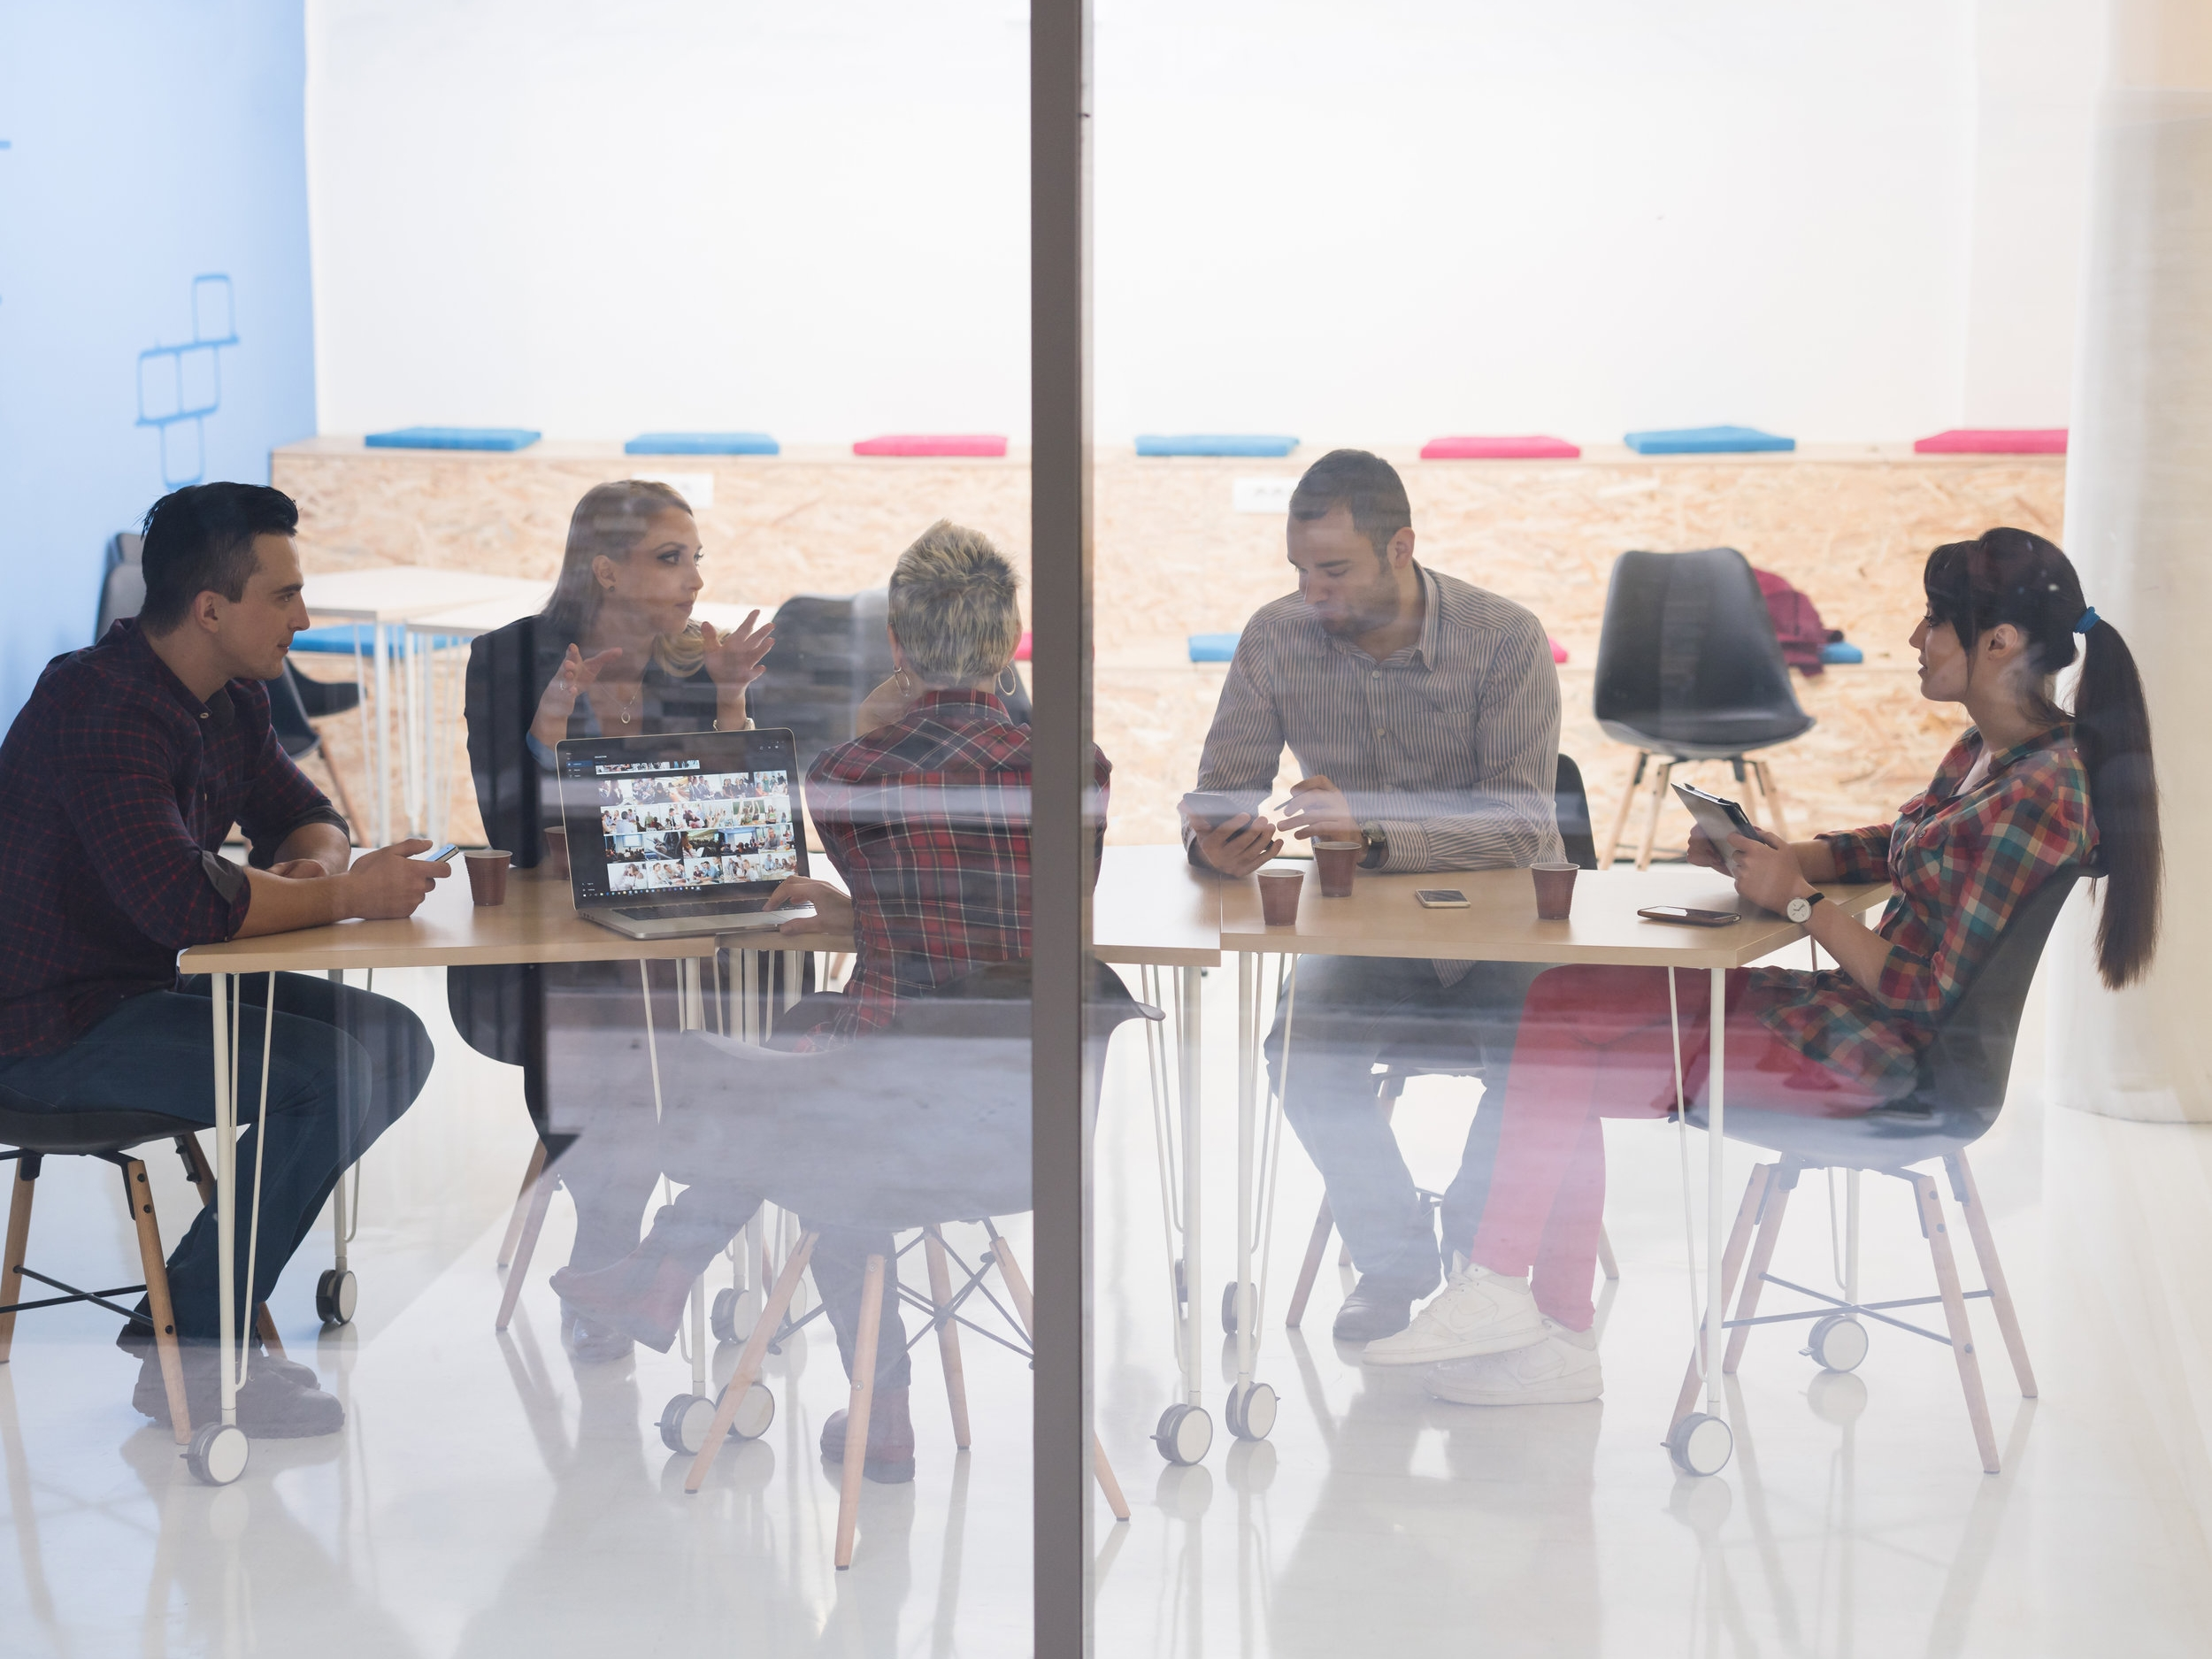 storyblocks-startup-business-team-on-meeting-in-modern-bright-office-interior-brainstorming-working-on-laptop-and-tablet-computer_BOQjkVk3W.jpg